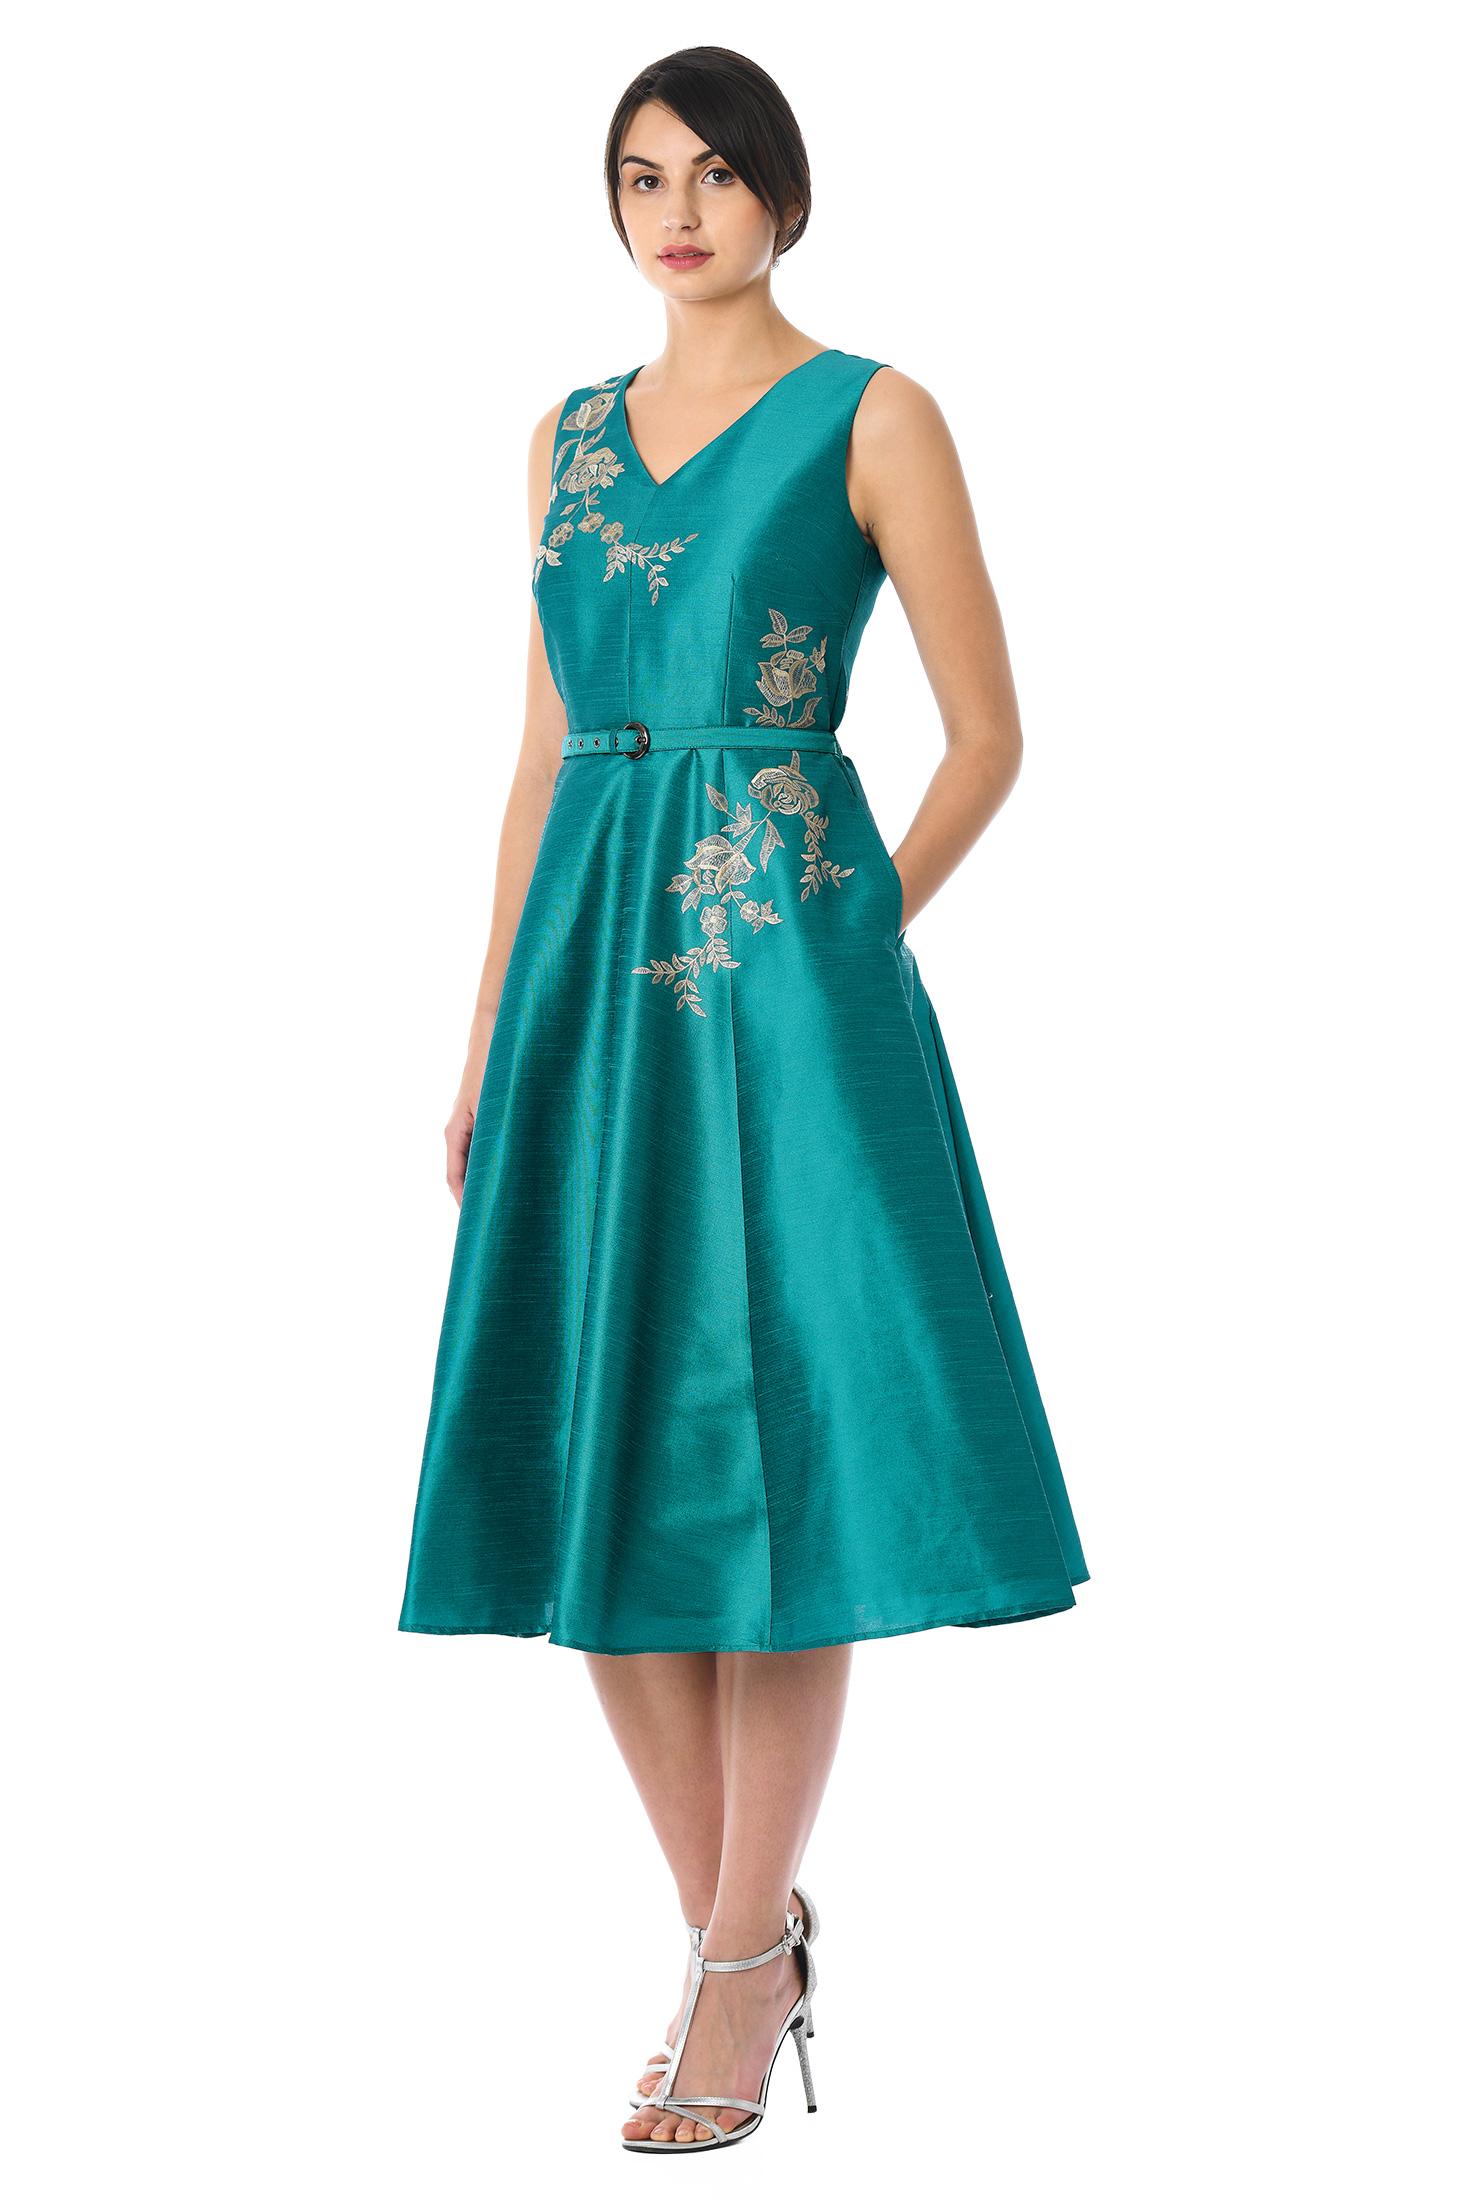 Women s Fashion Clothing 0-36W and Custom a724b5afe